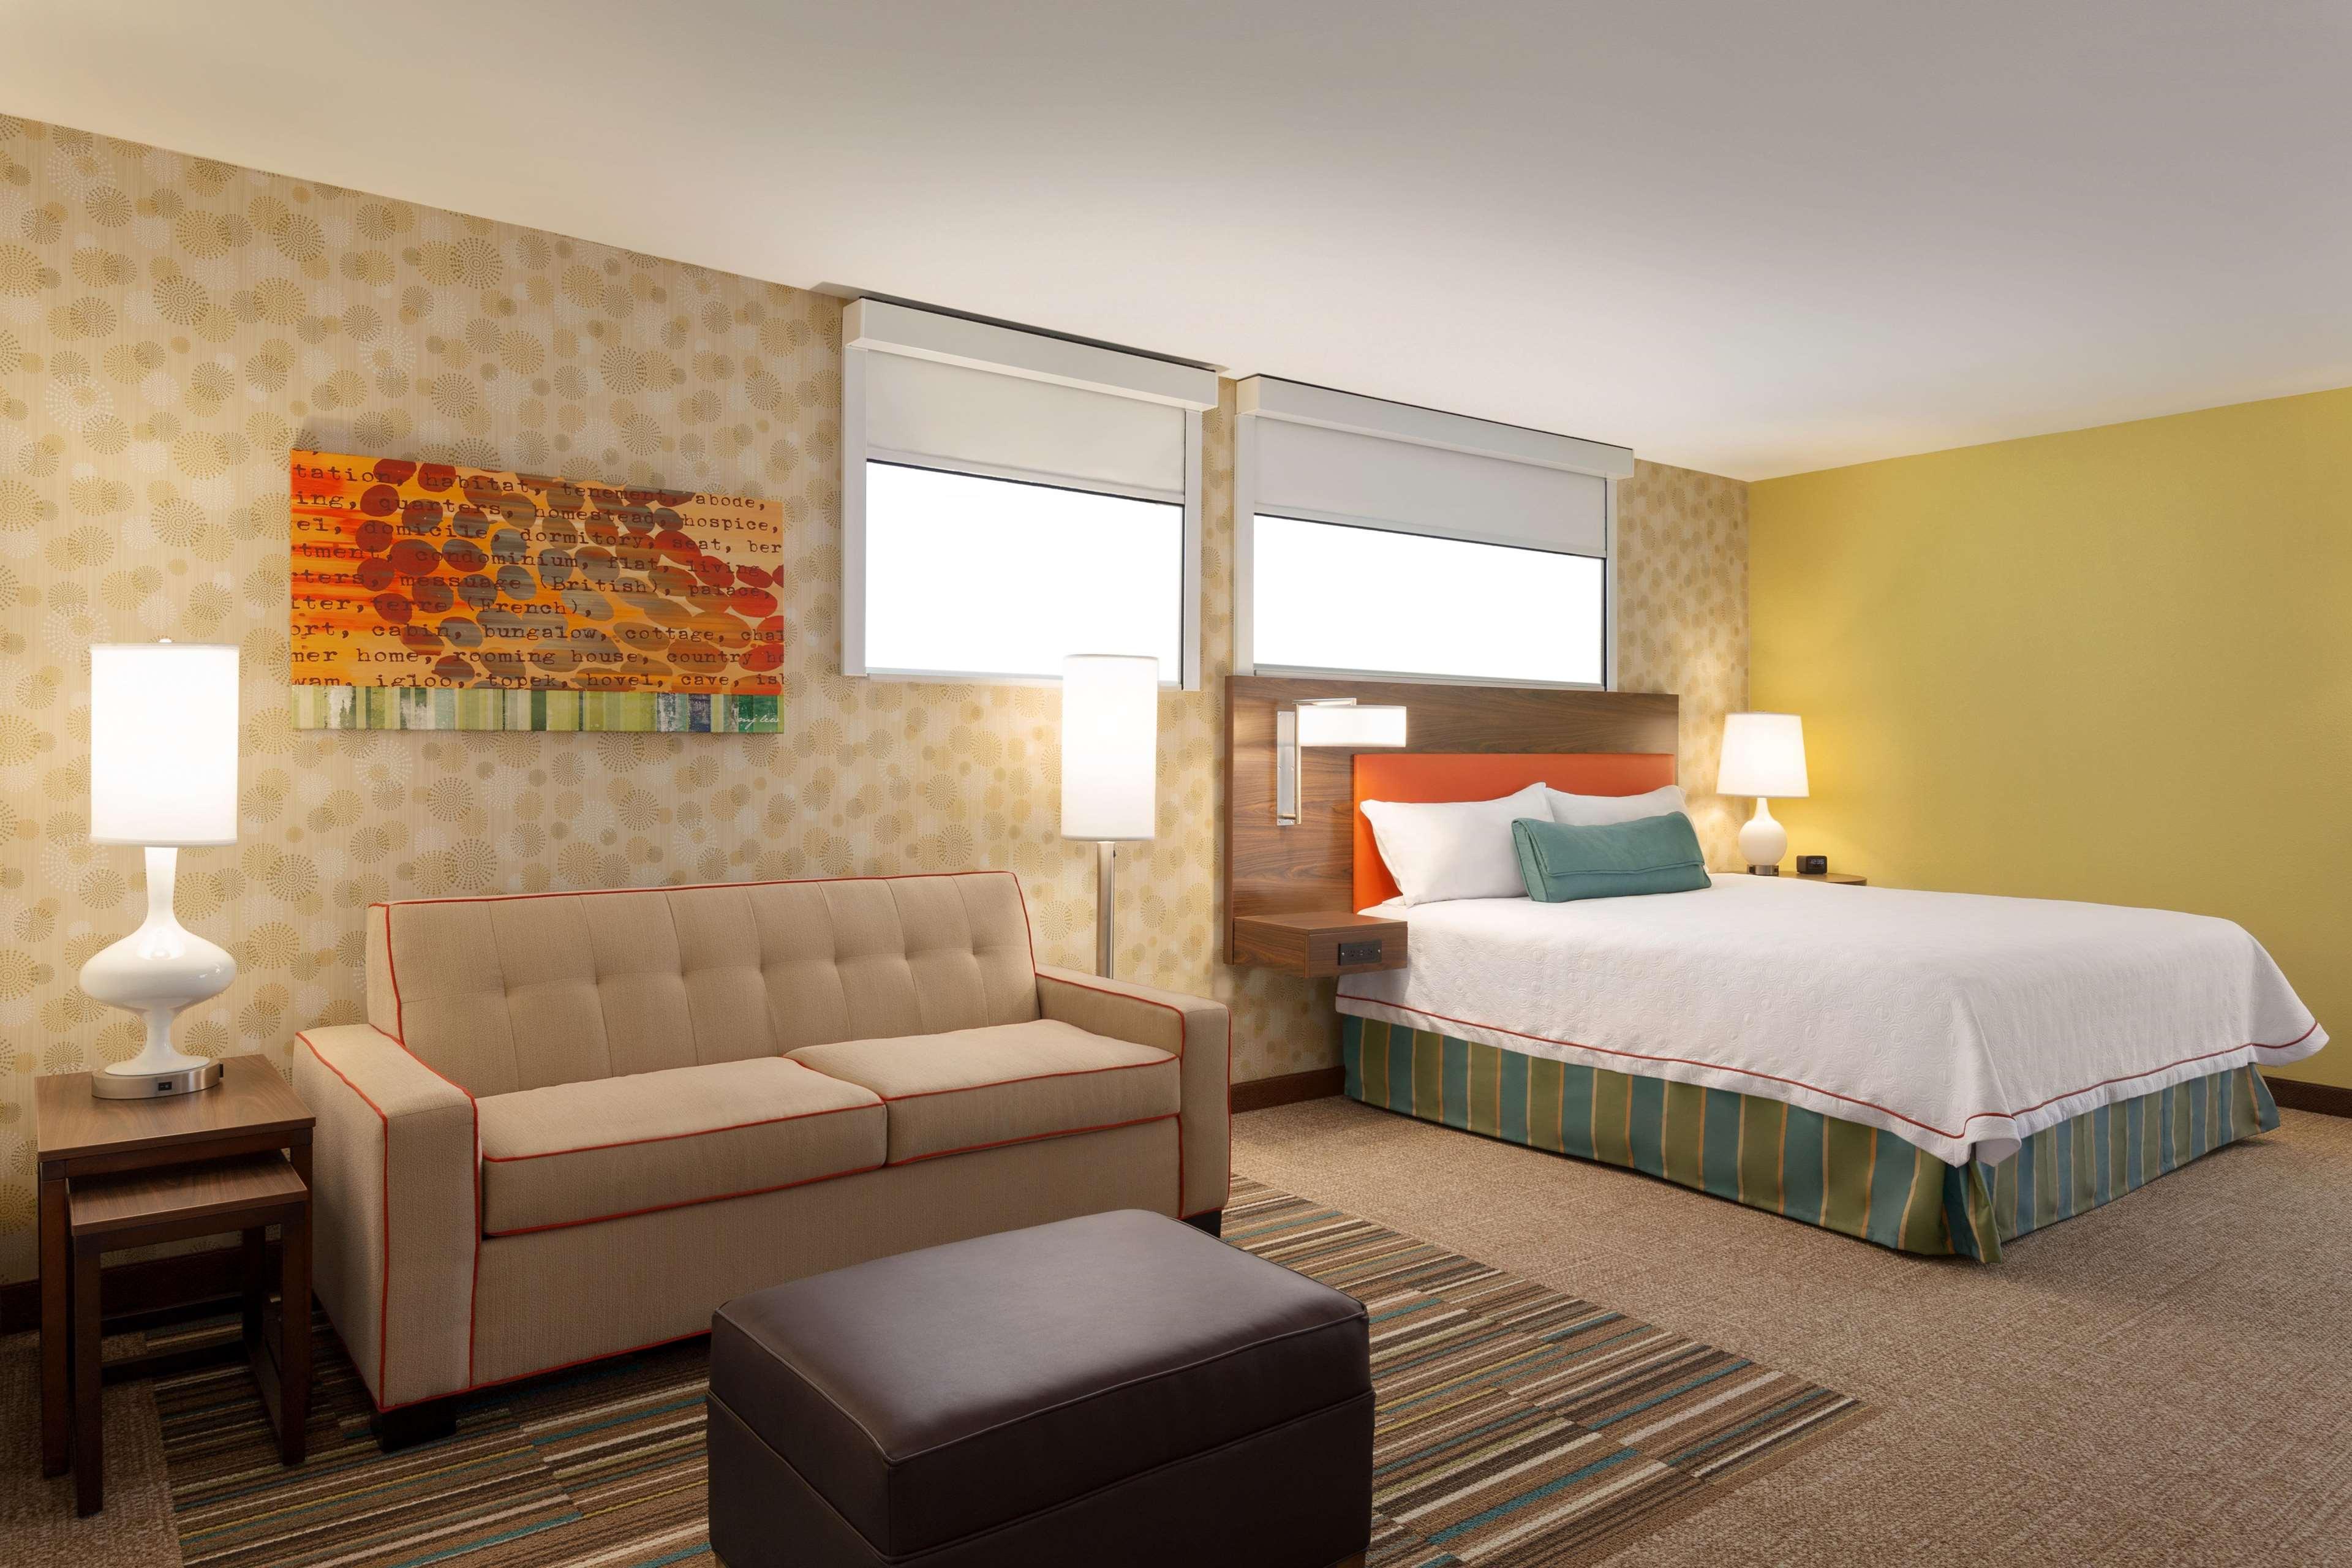 Home2 Suites by Hilton Waco image 6